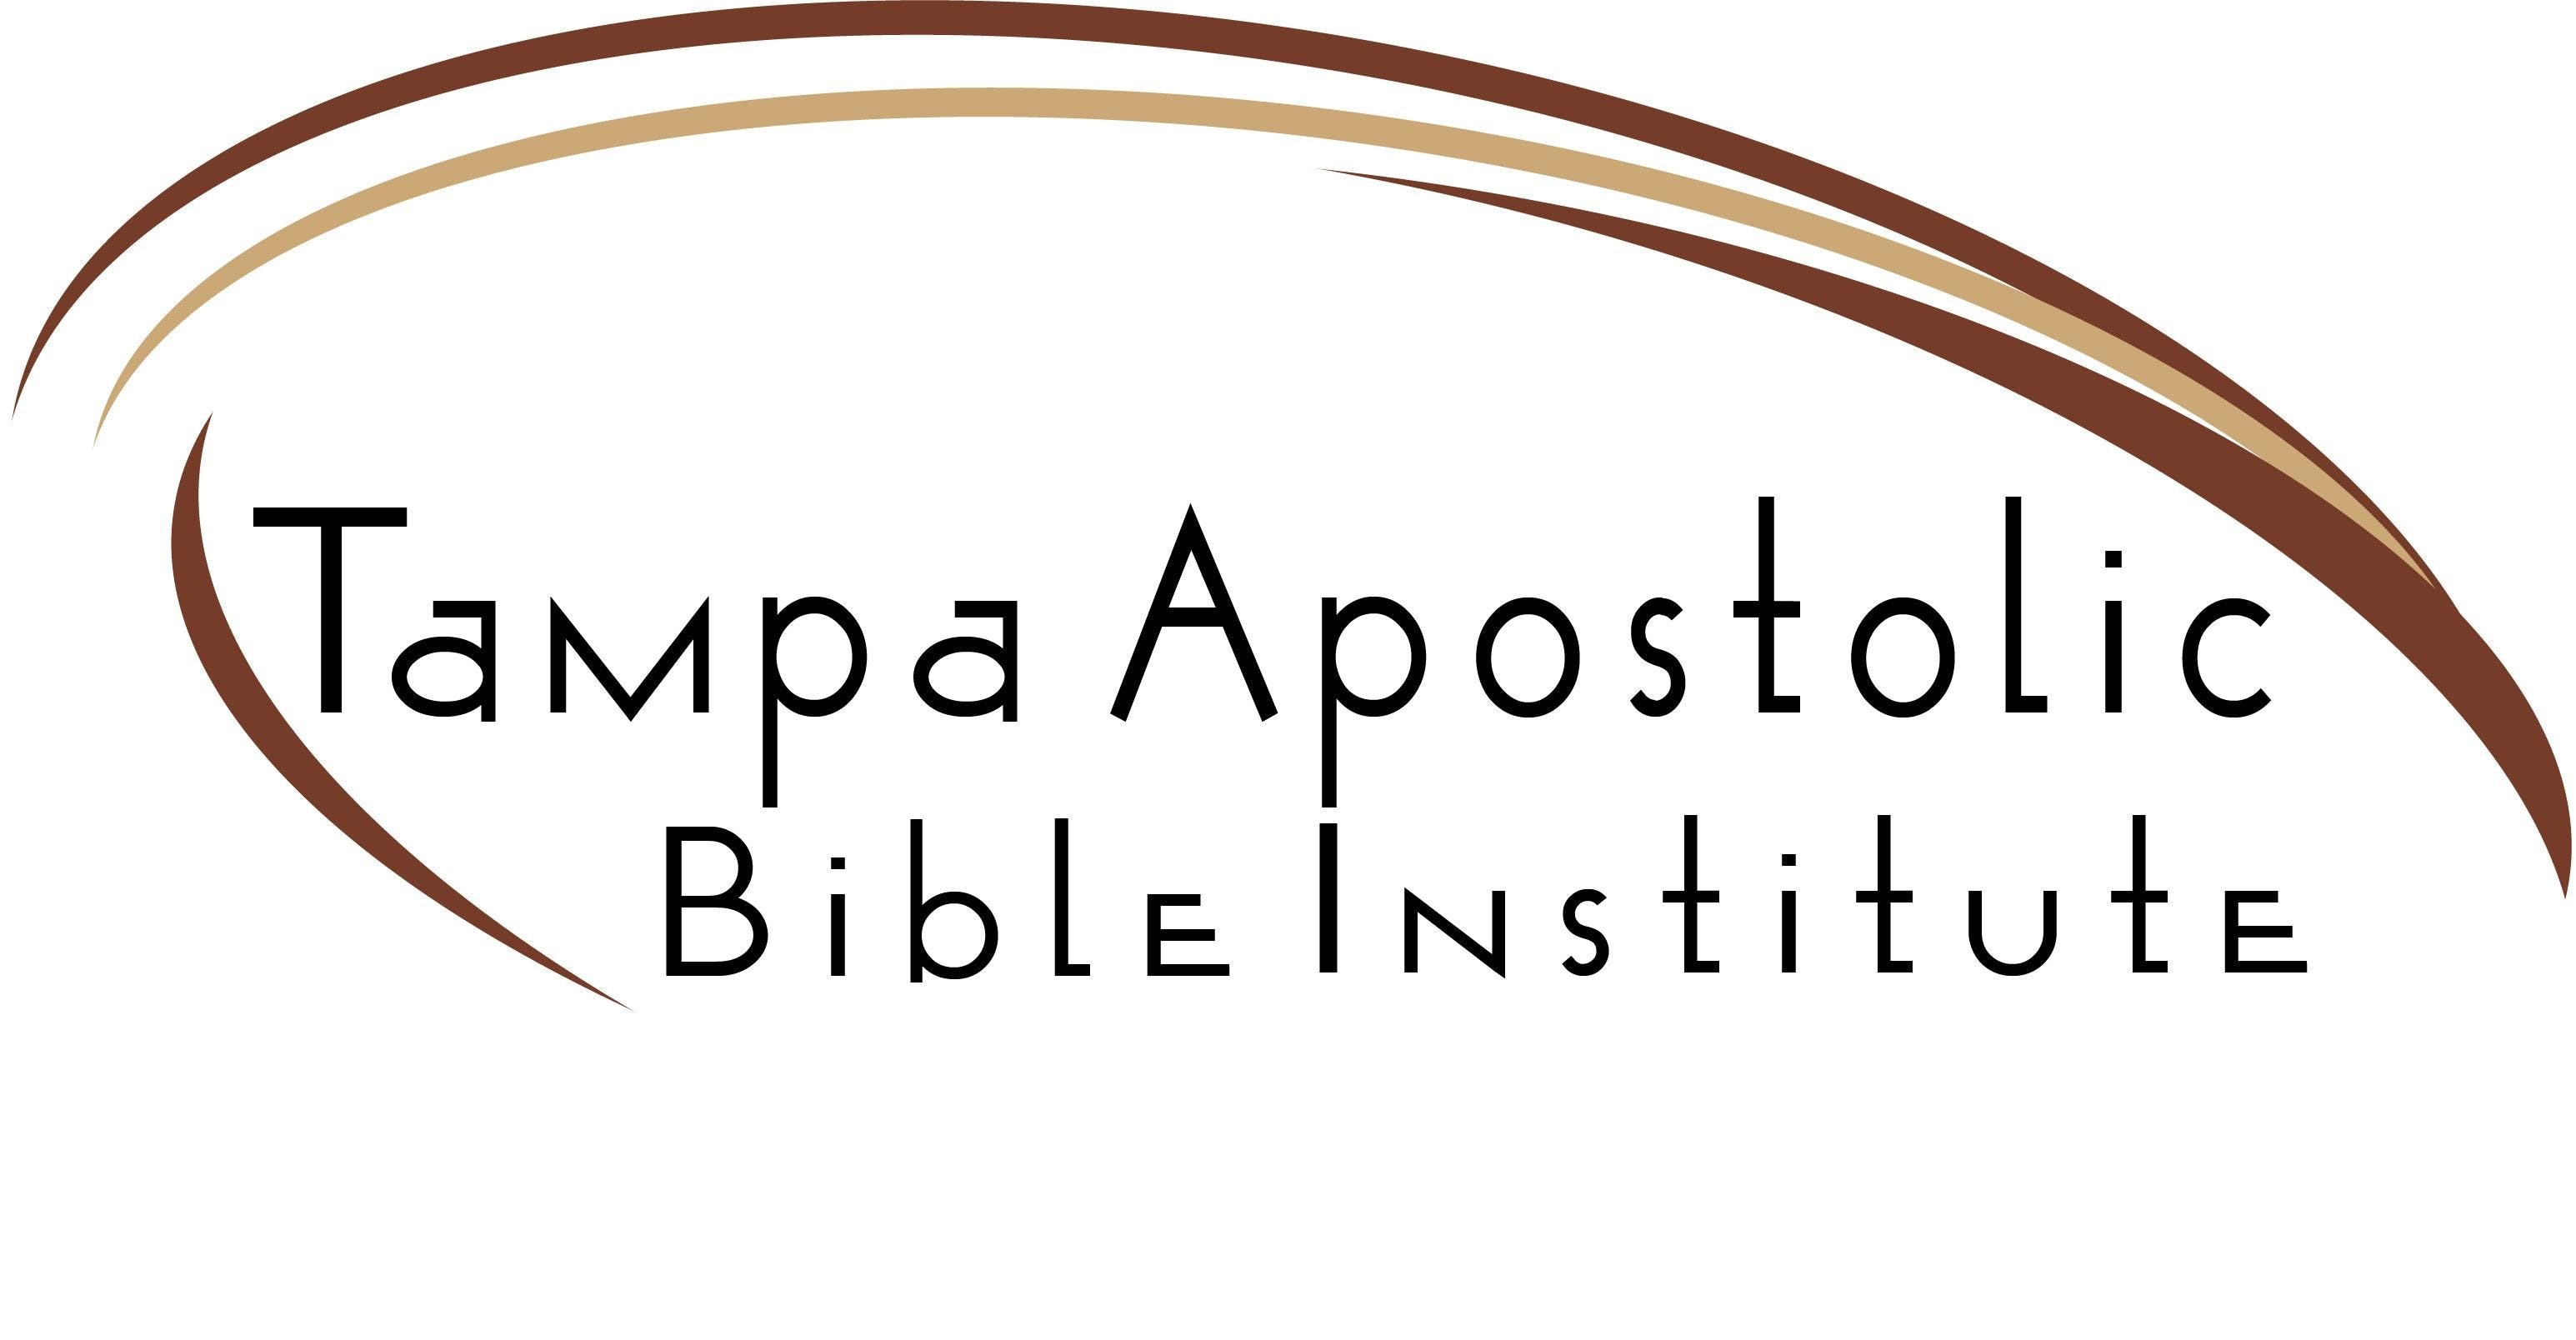 Tampa Apostolic Bible Institute Orientation at New Life